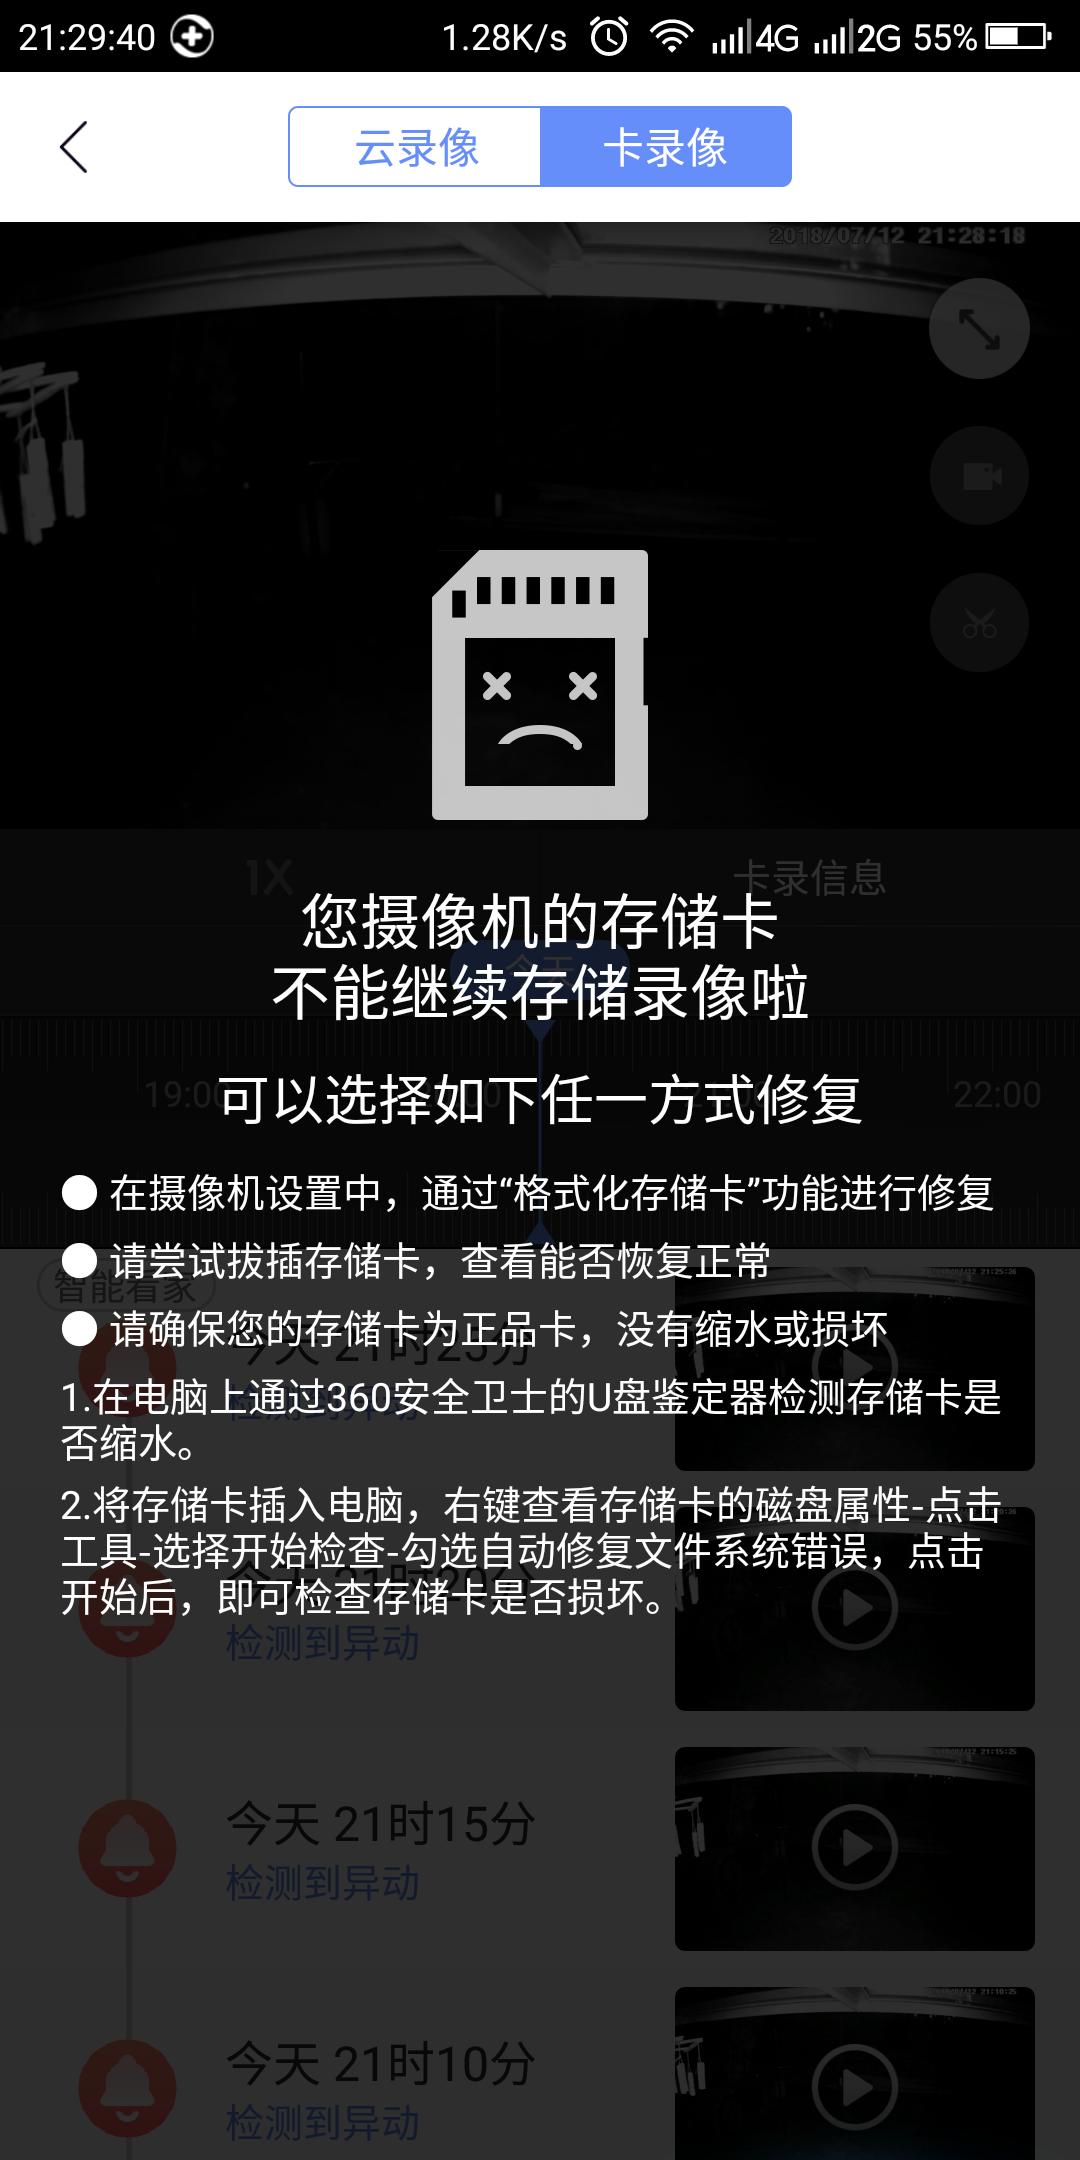 Screenshot_2018-07-12-21-29-43.png